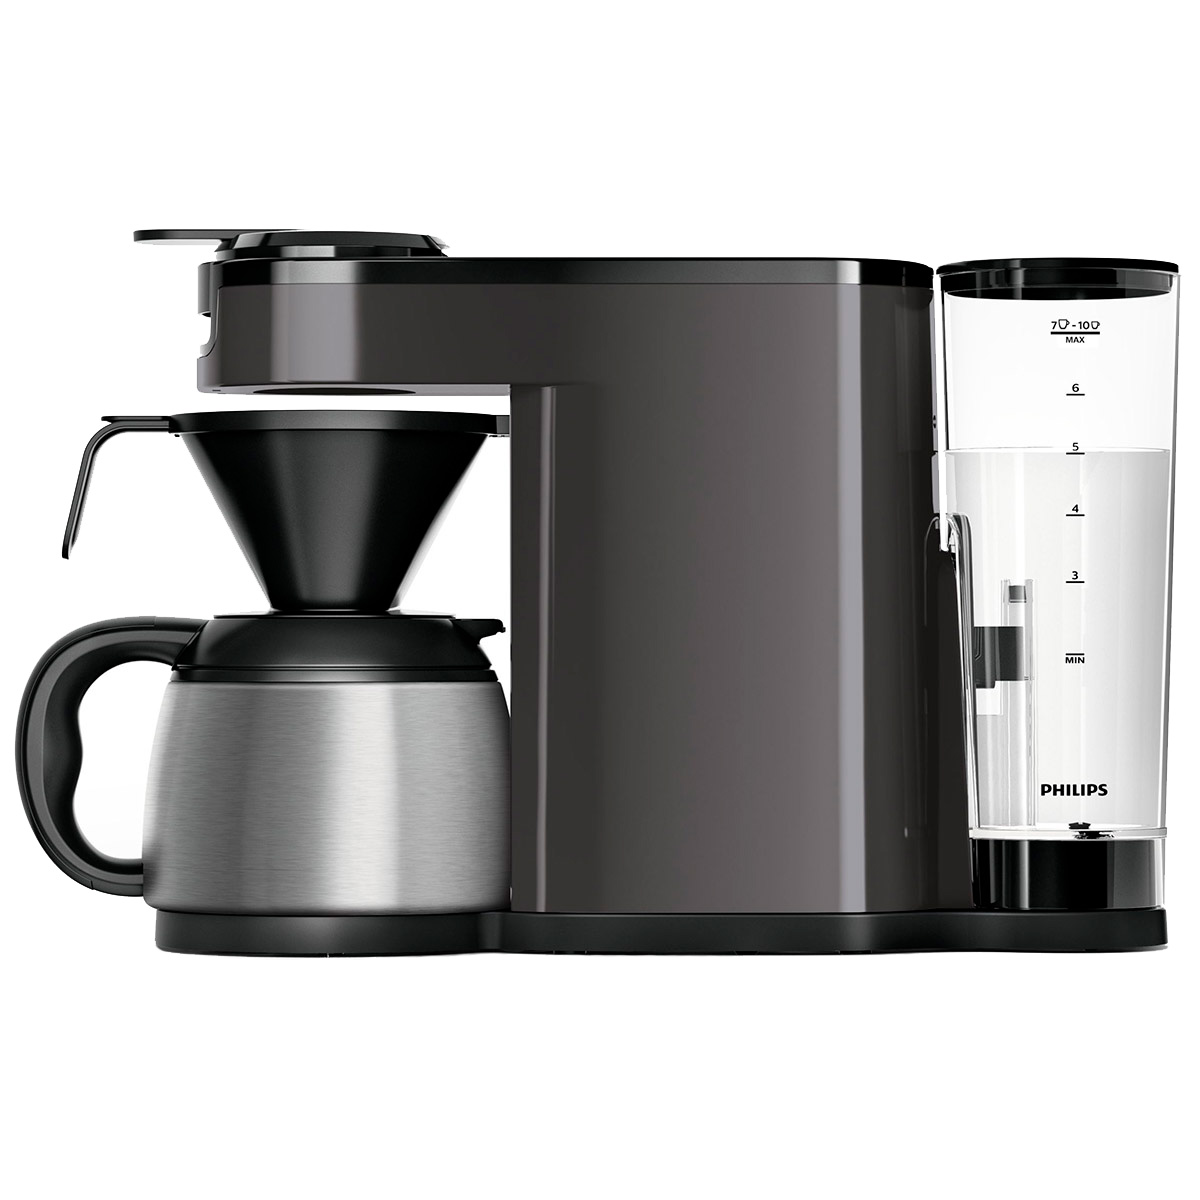 Image of   Philips kaffemaskine - Senseo Switch 3in1